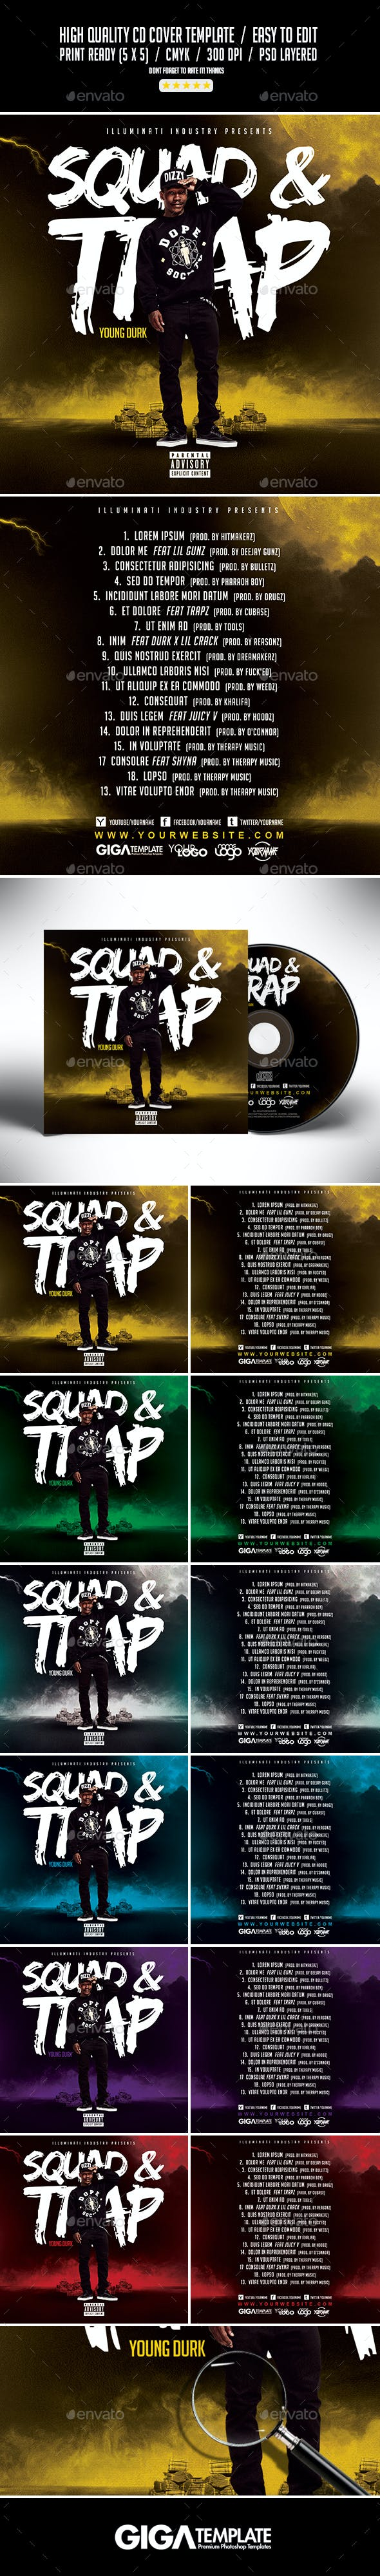 Squad & Trap | Hip-Hop Mixtape Album CD Cover Template